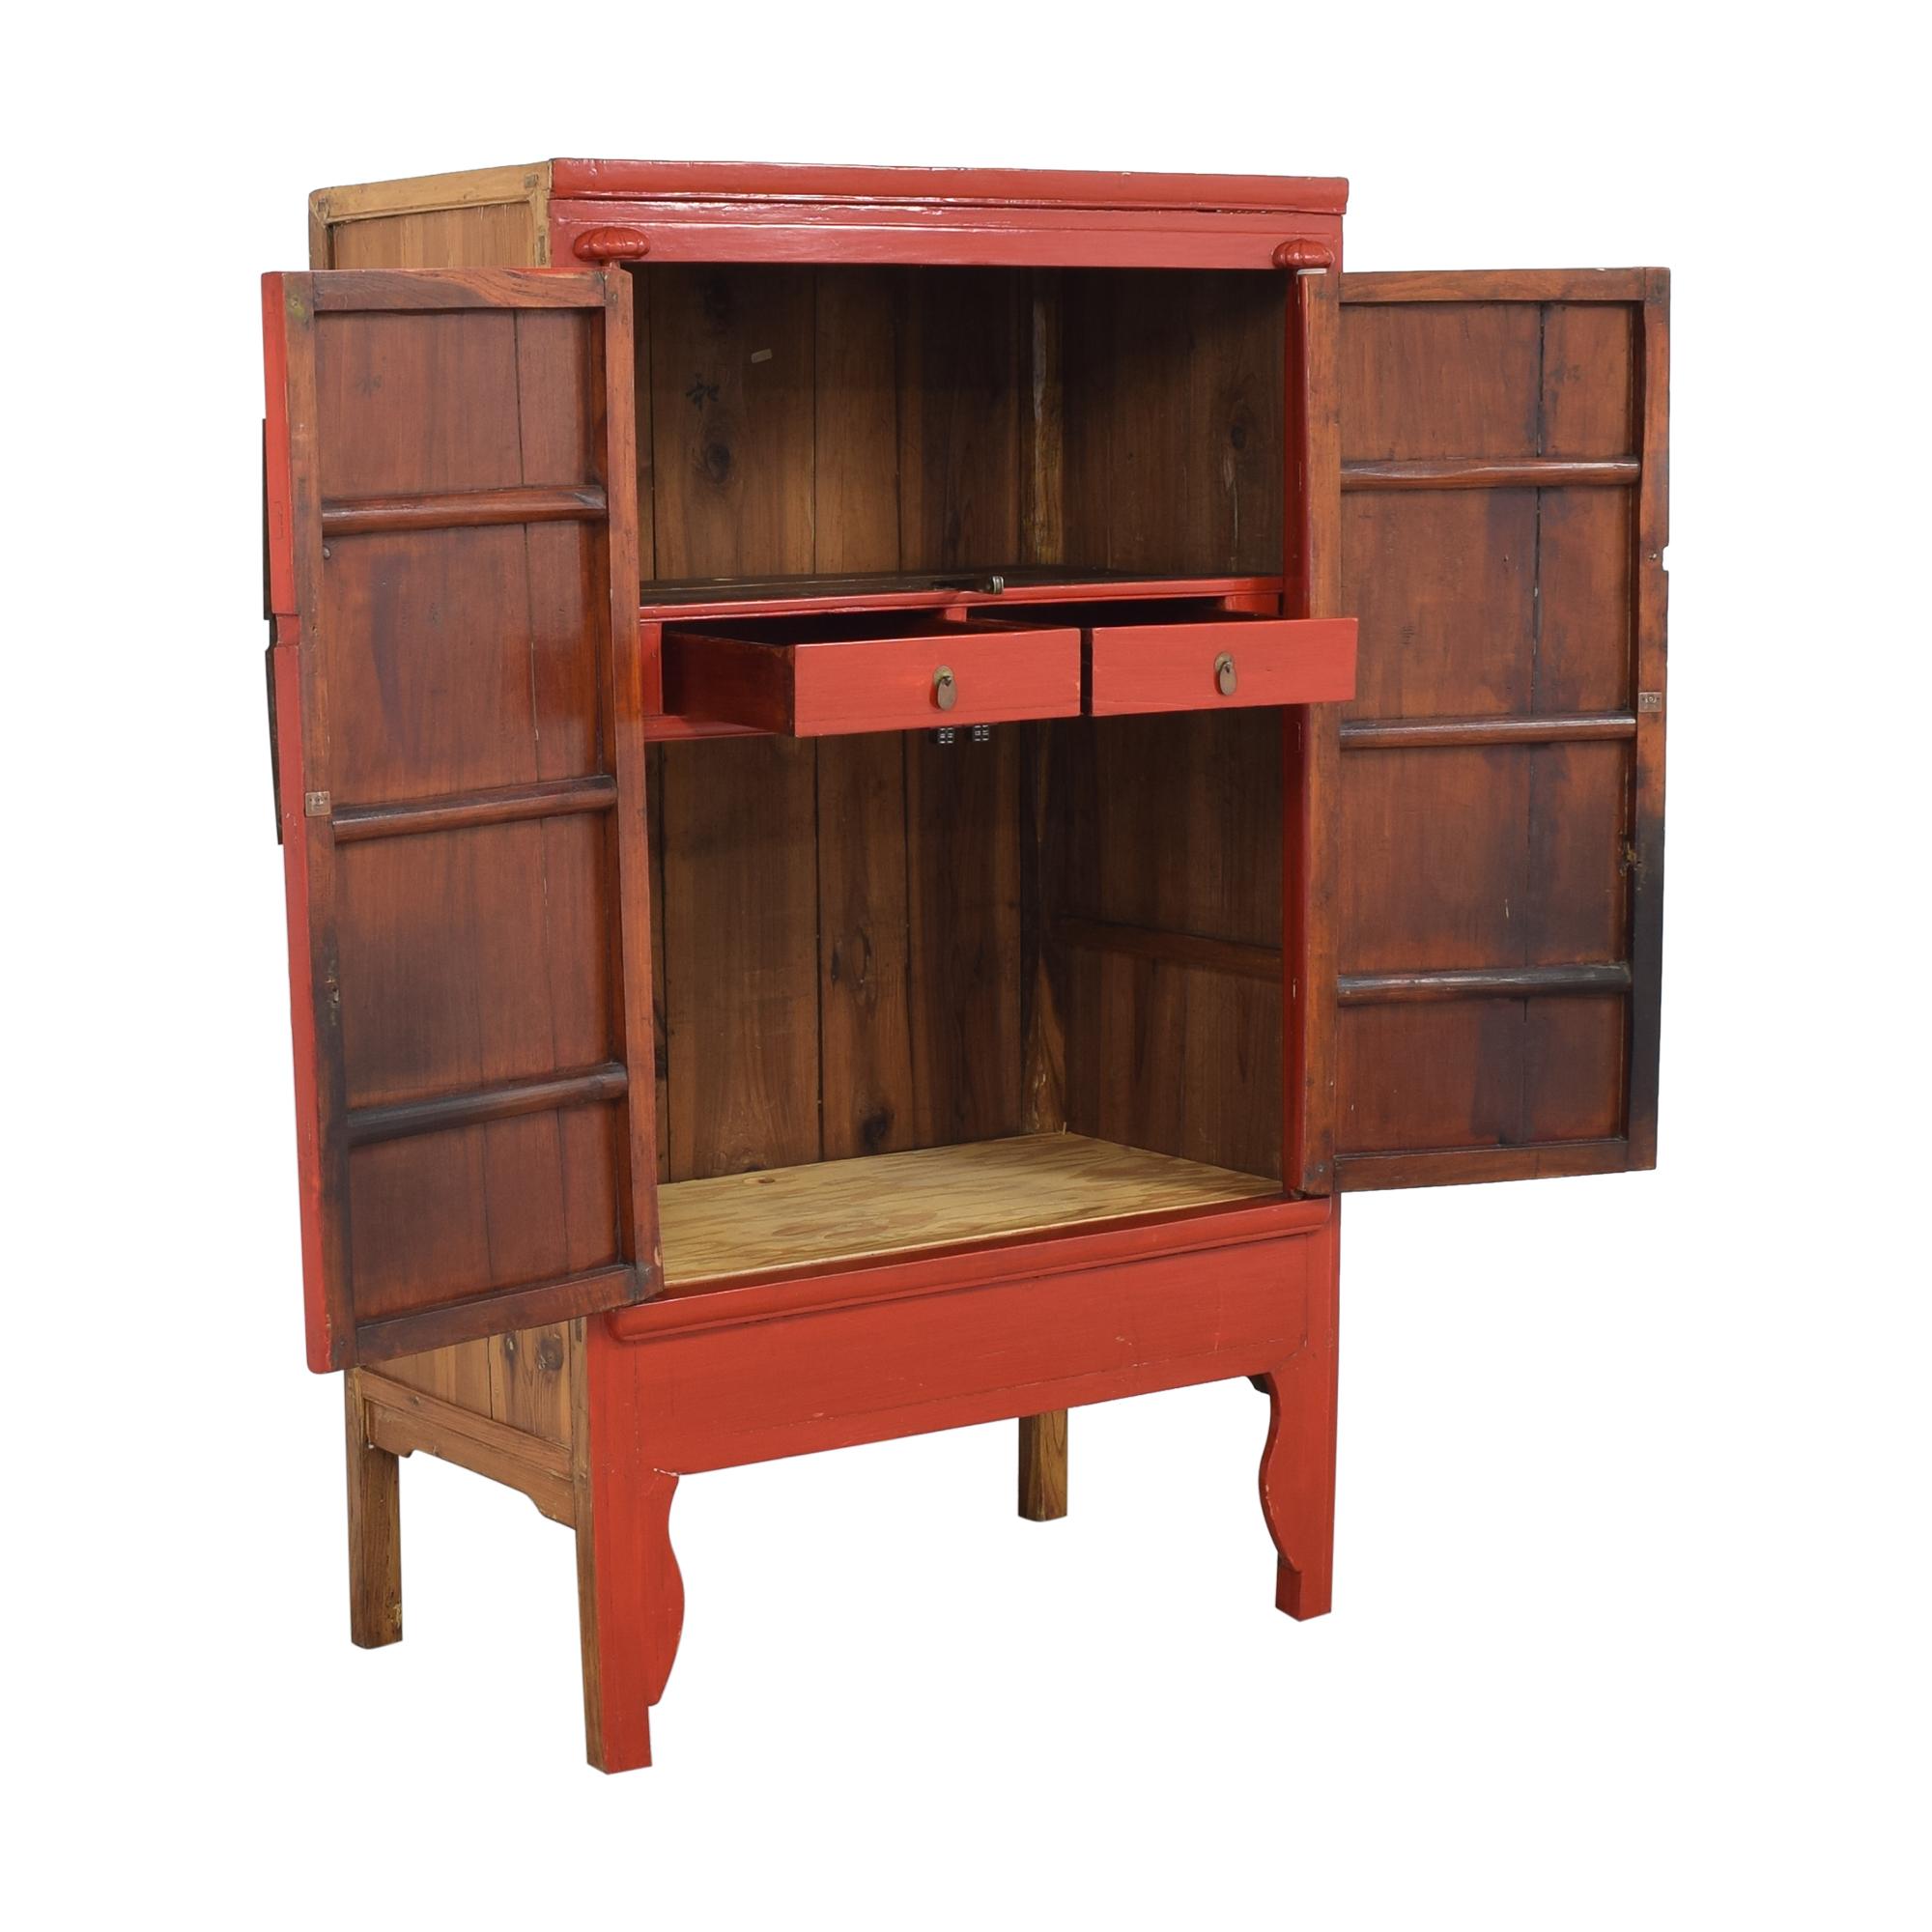 Vintage Style Chinese Wedding Cabinet used